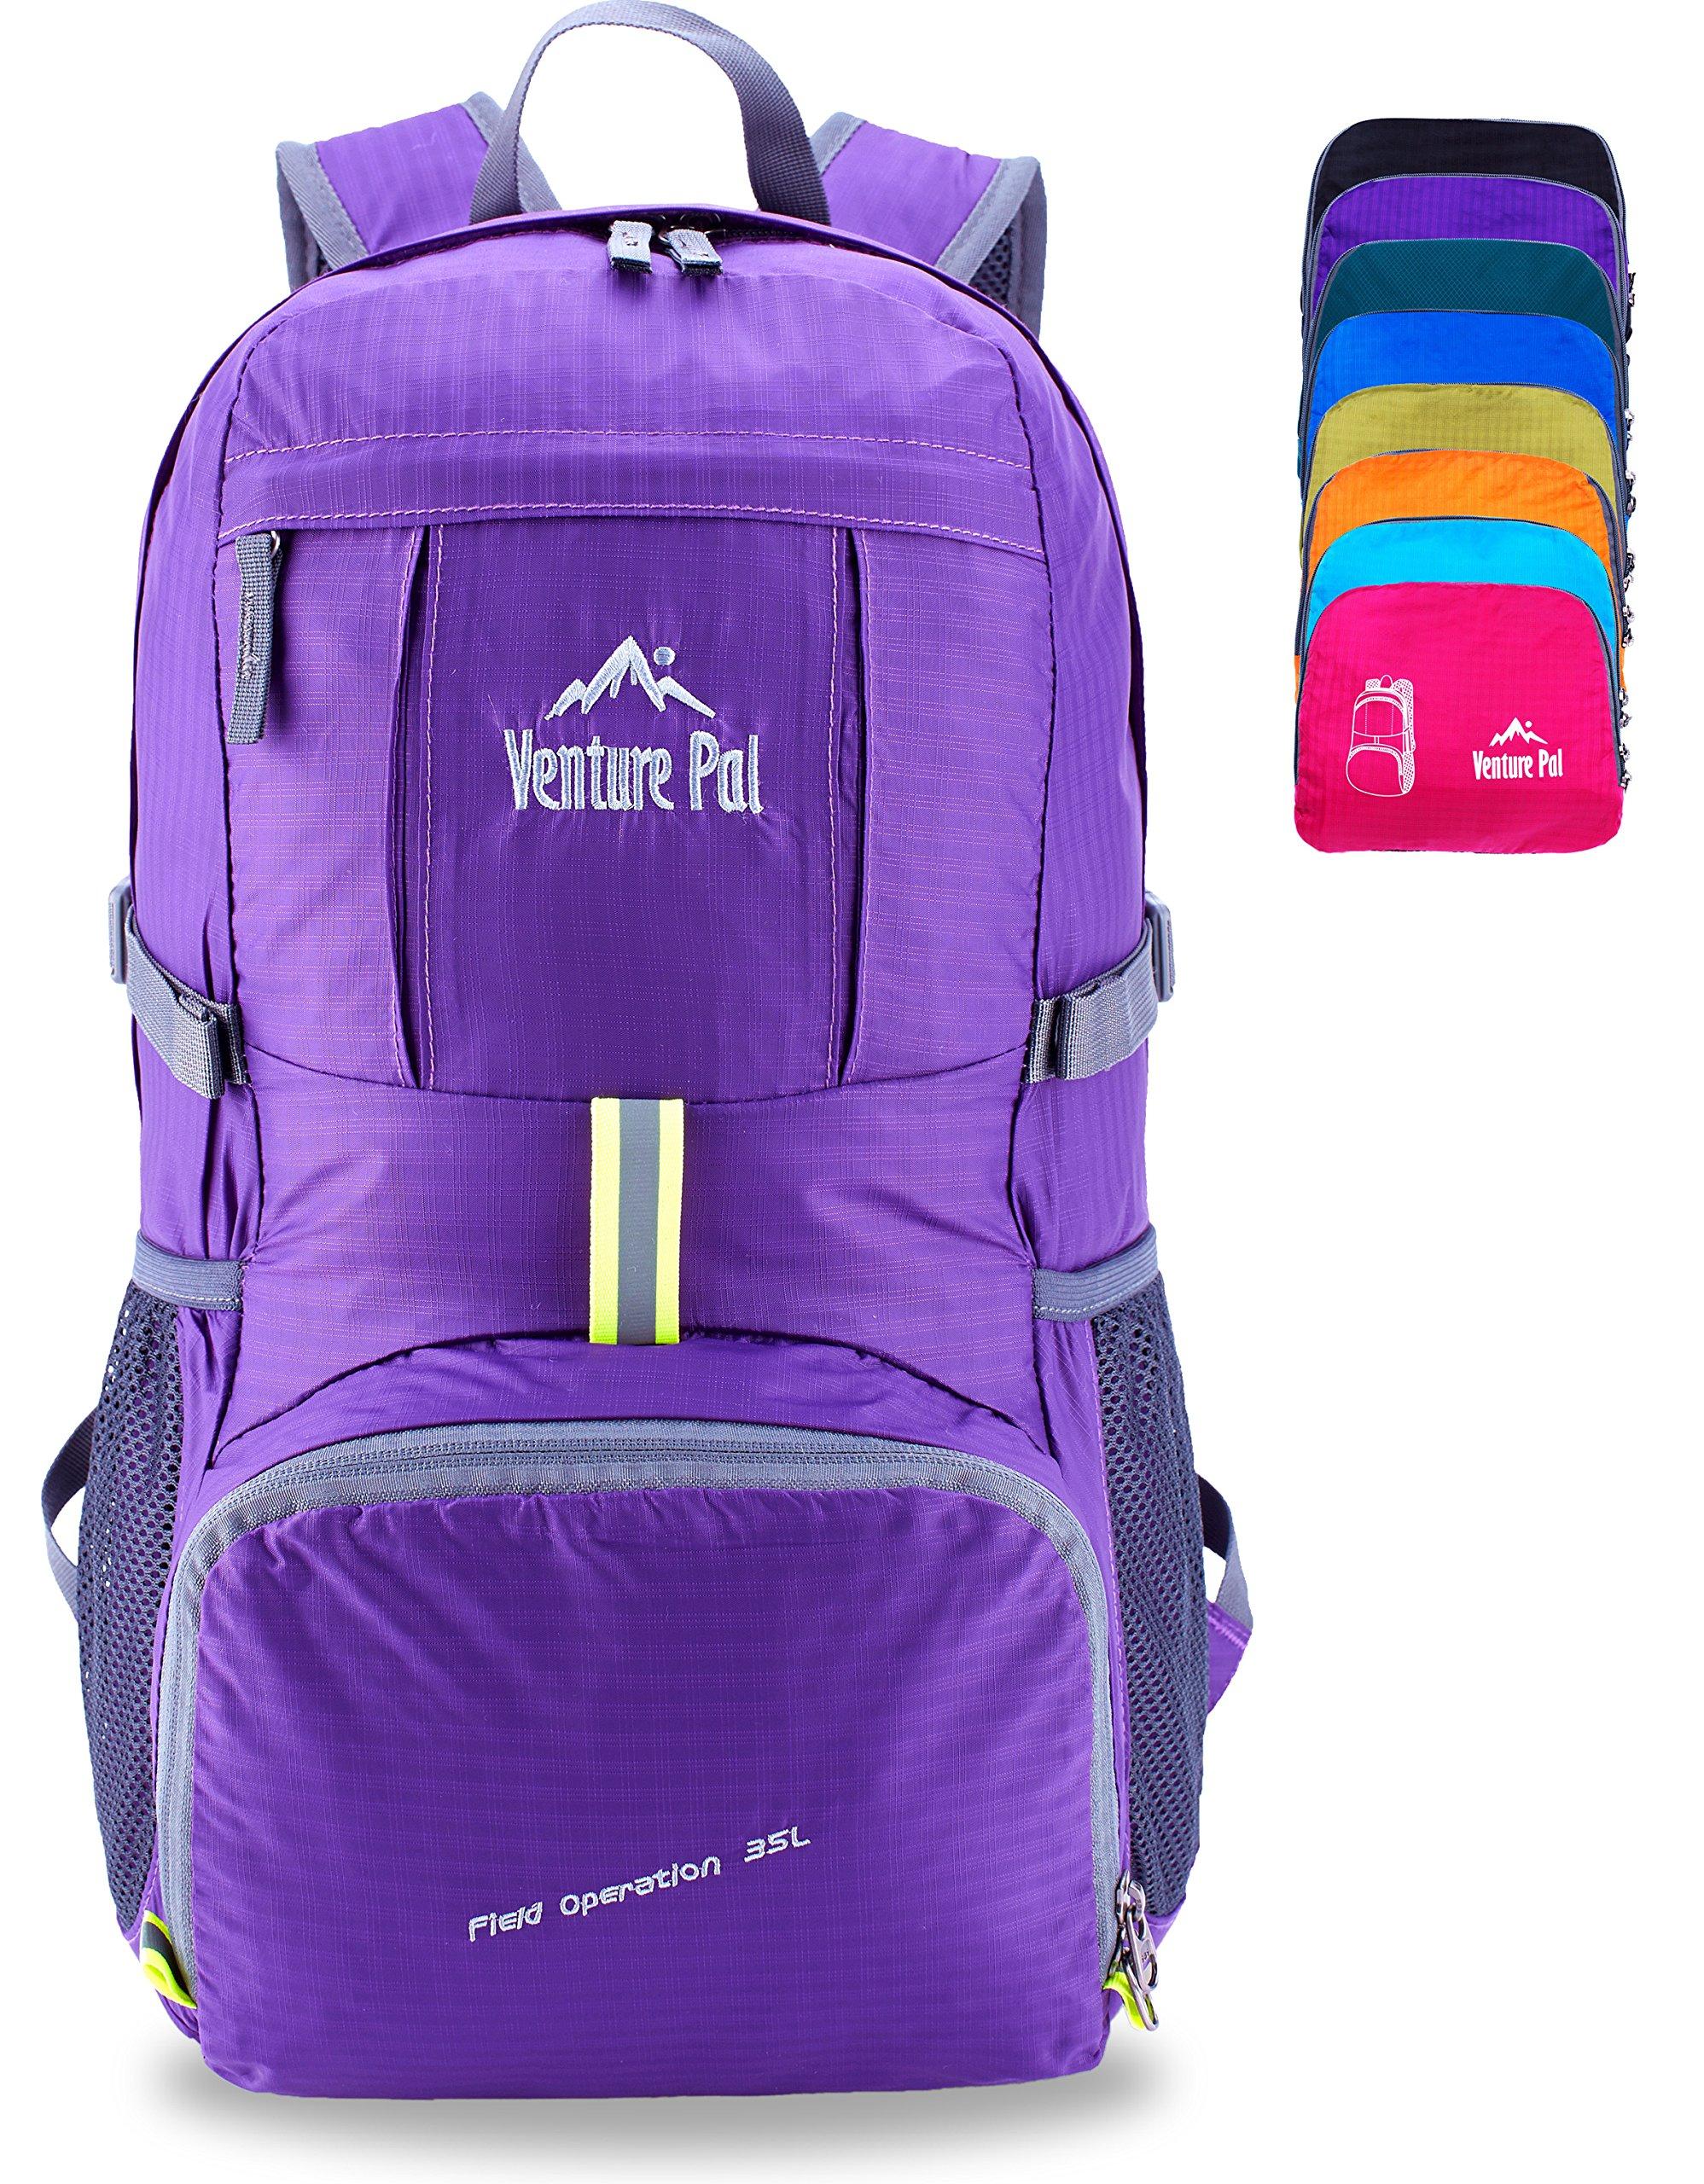 Venture Pal Lightweight Packable Durable Travel Hiking Backpack Daypack (Purple) …